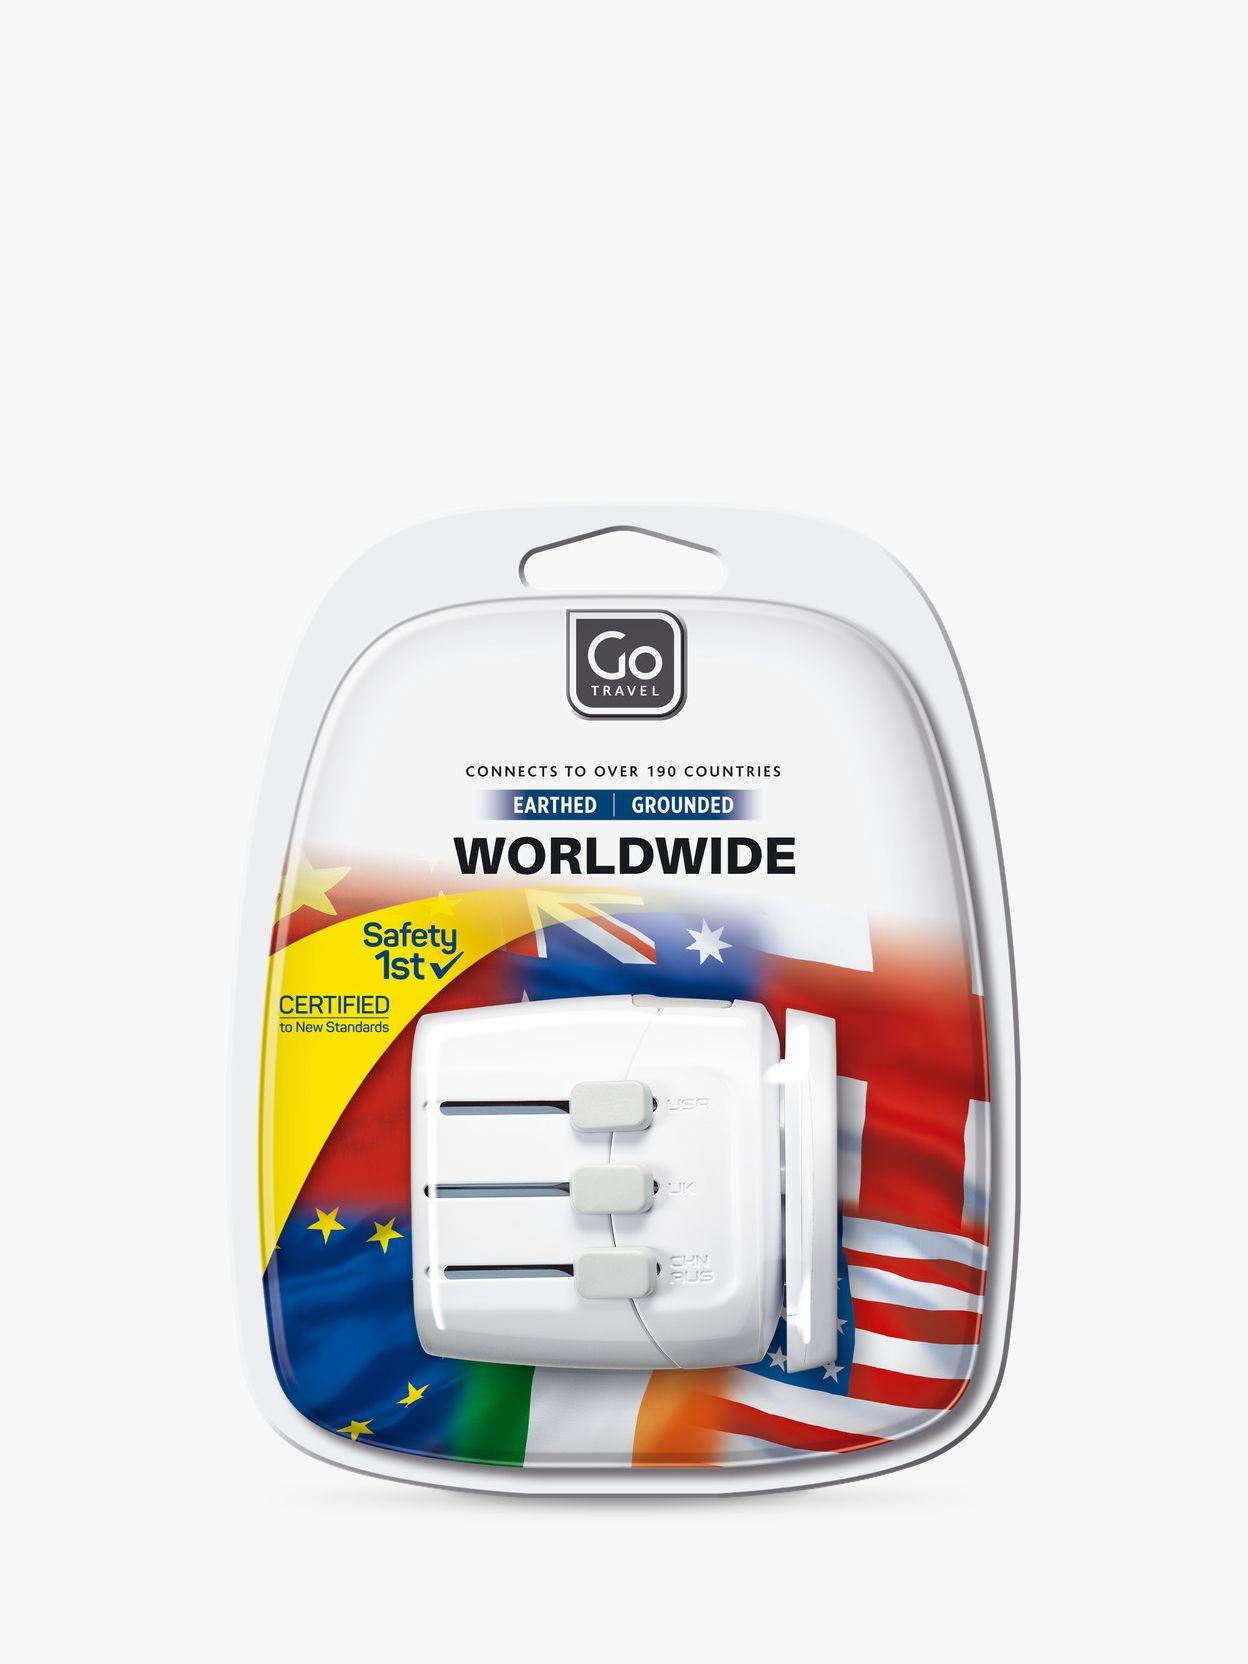 Go Travel Go Travel Worldwide Adaptor for UK Electrical